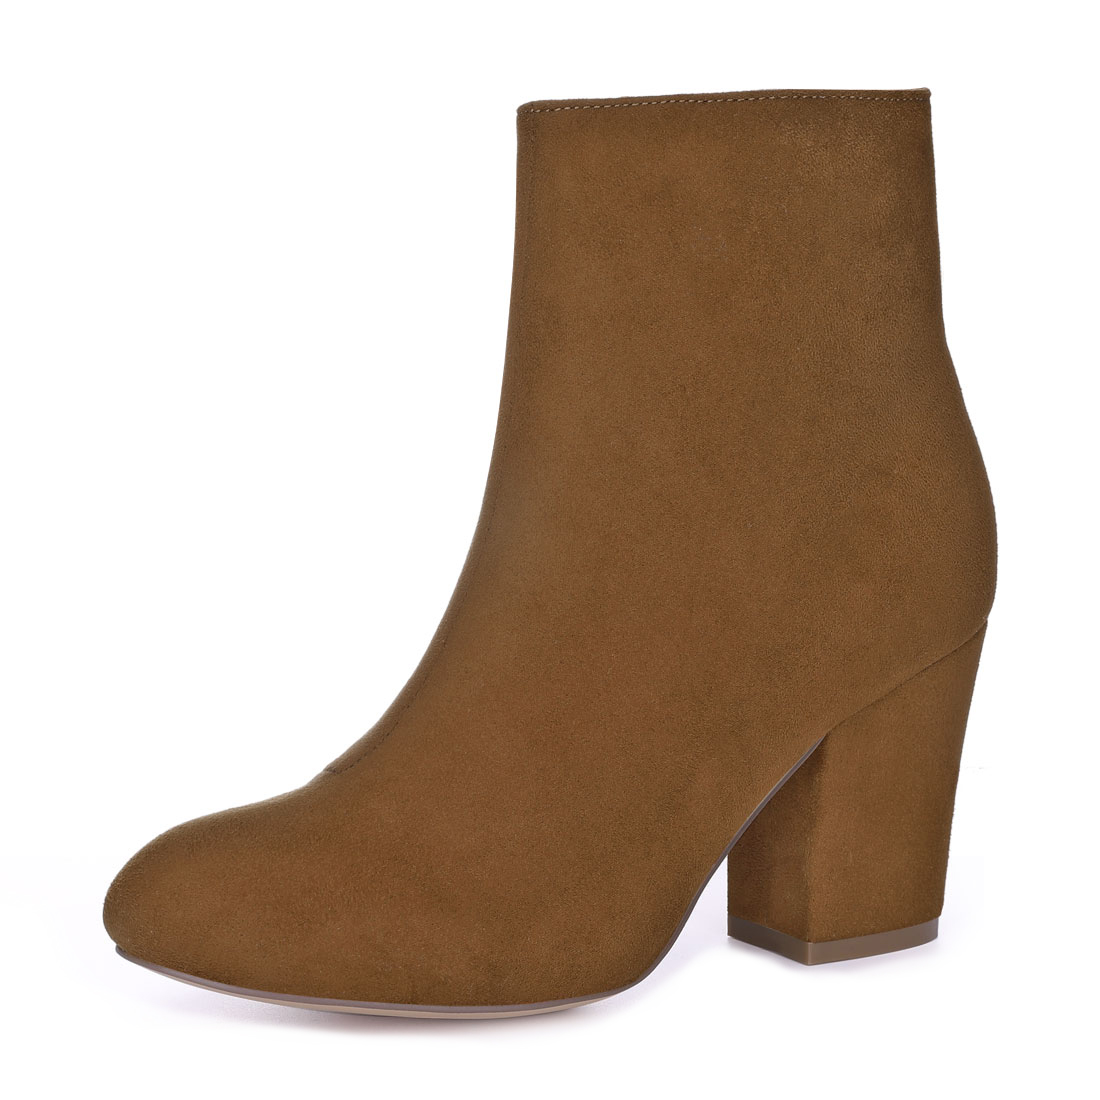 Allegra K Women Round Toe Side Zipper Block Heel Ankle Boots Brown US 8